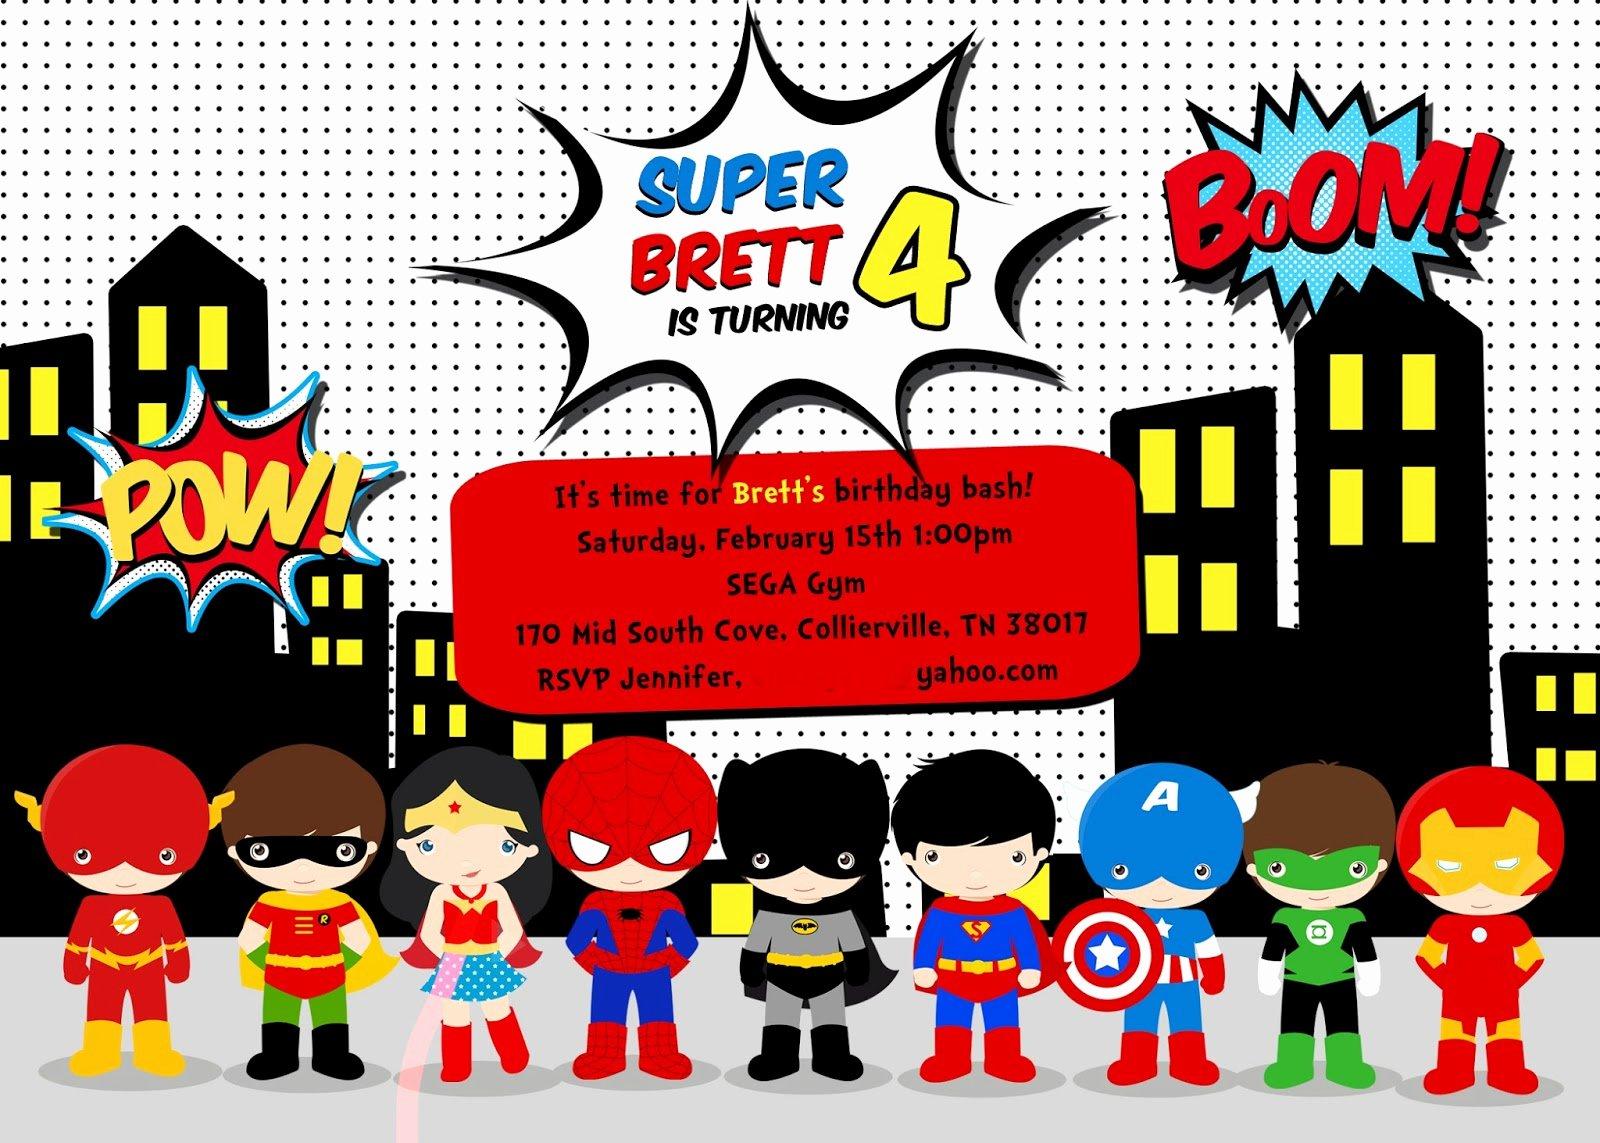 Super Hero Birthday Invitations Awesome Greygrey Designs My Parties Brett S Superhero 4th Birthday Party